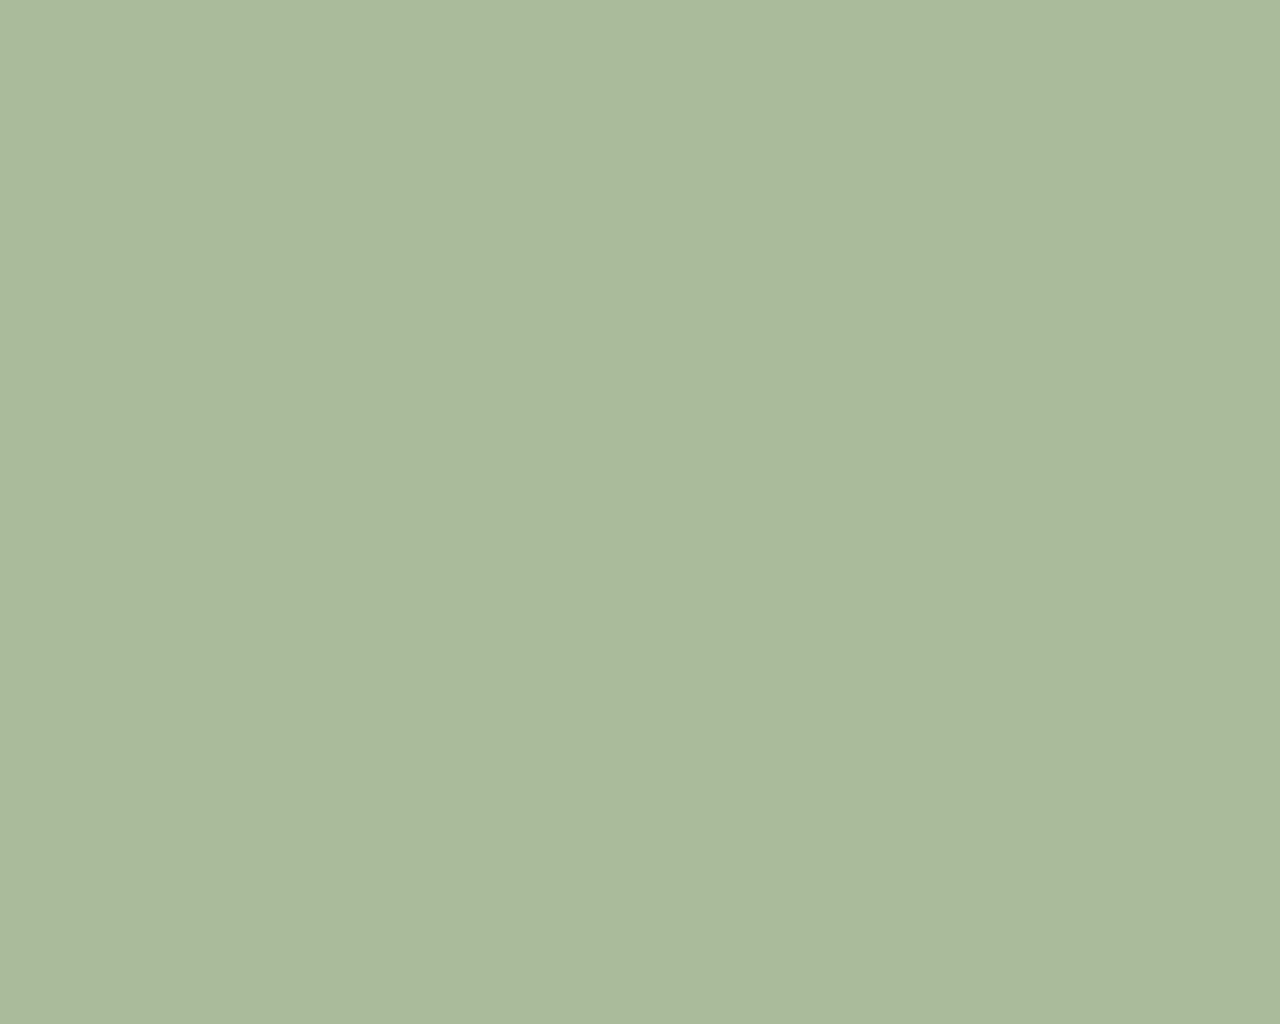 1280x1024 Laurel Green Solid Color Background